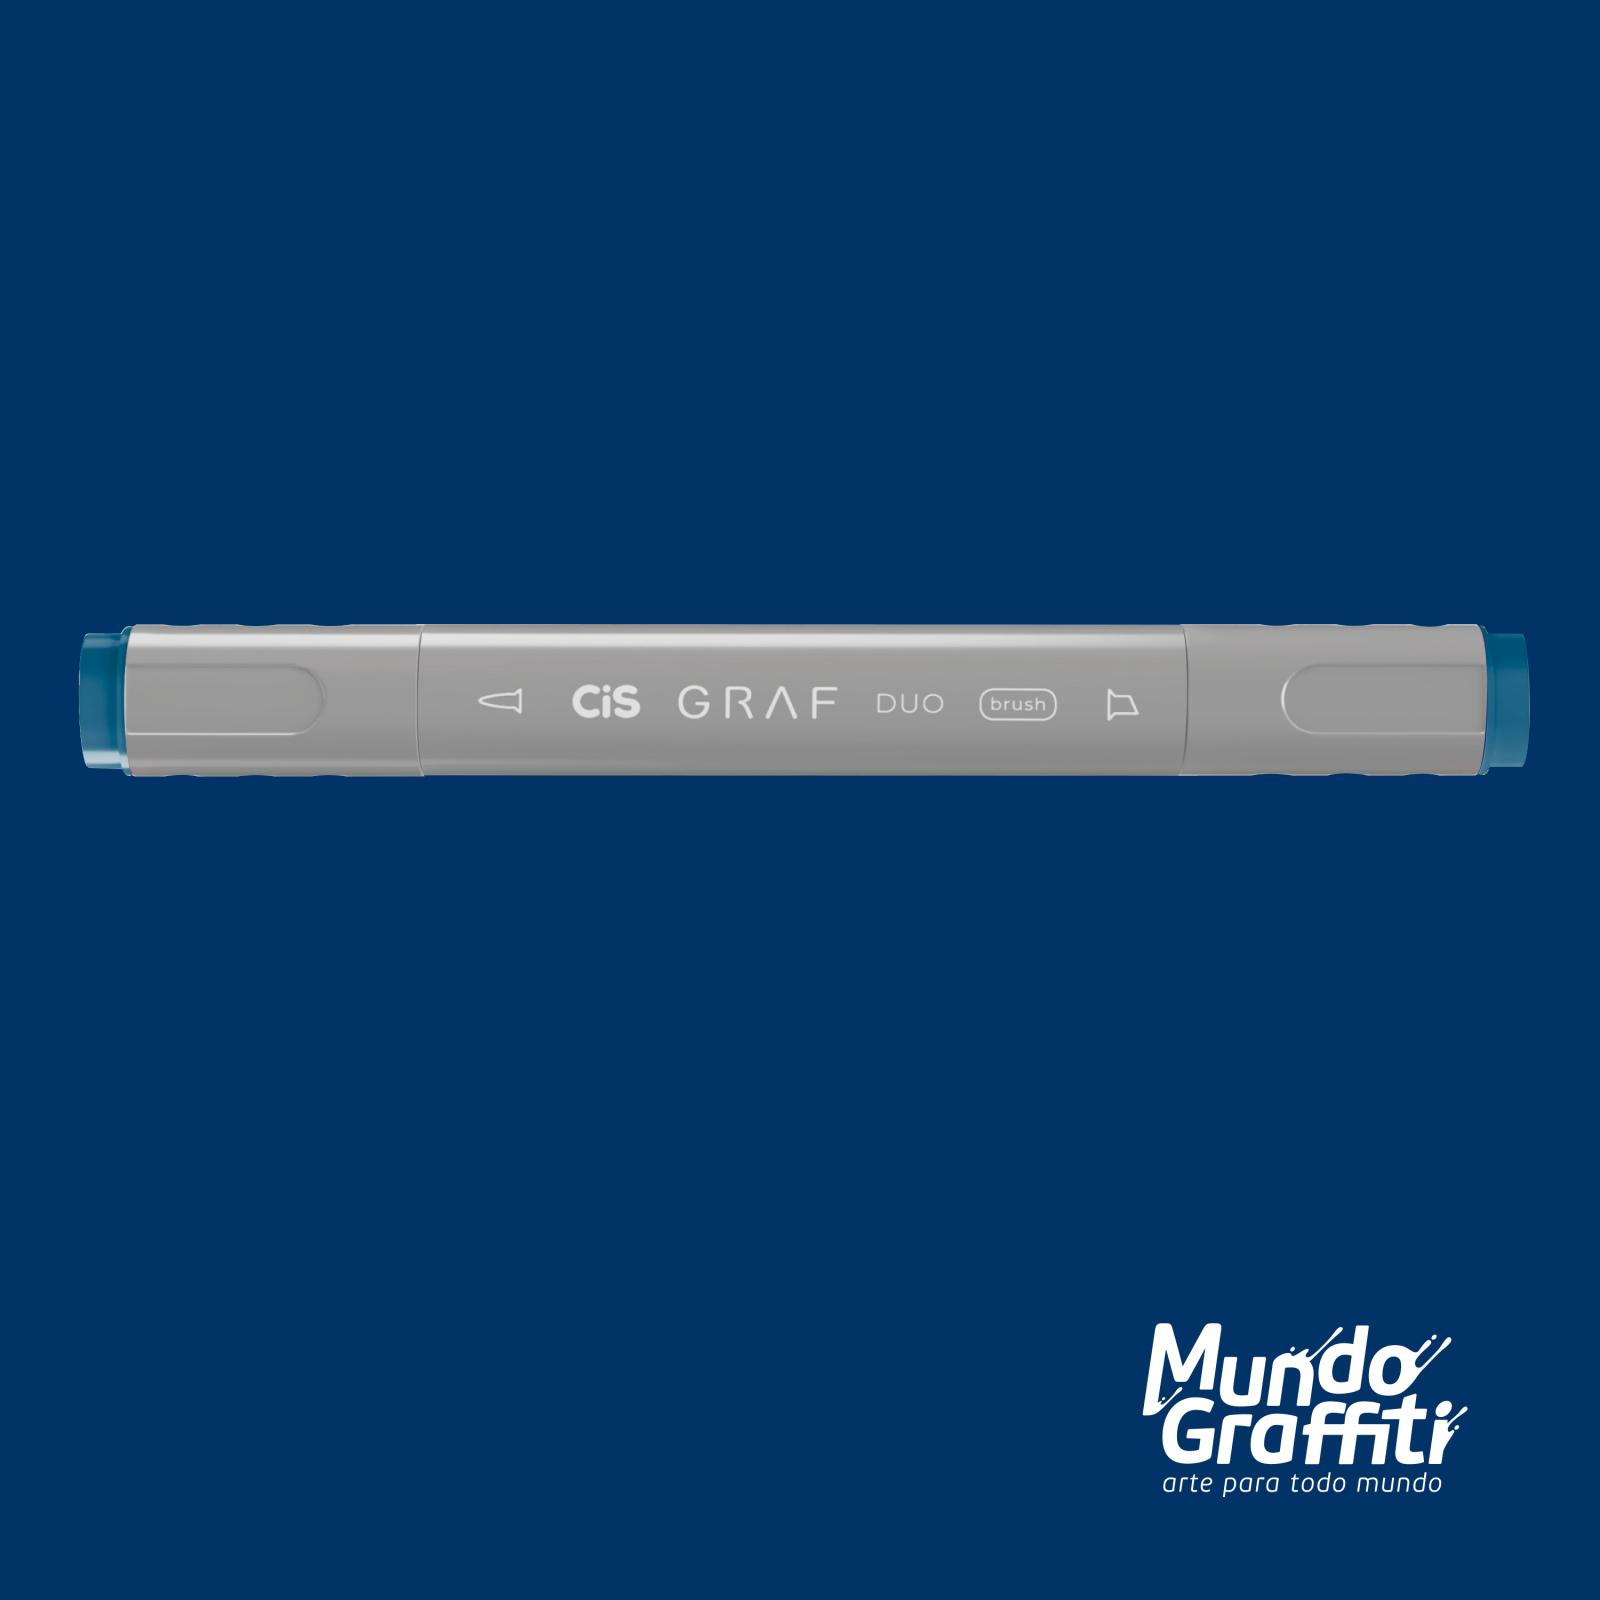 Marcador Cis Graf Duo Brush Prussian Blue 69 - Mundo Graffiti